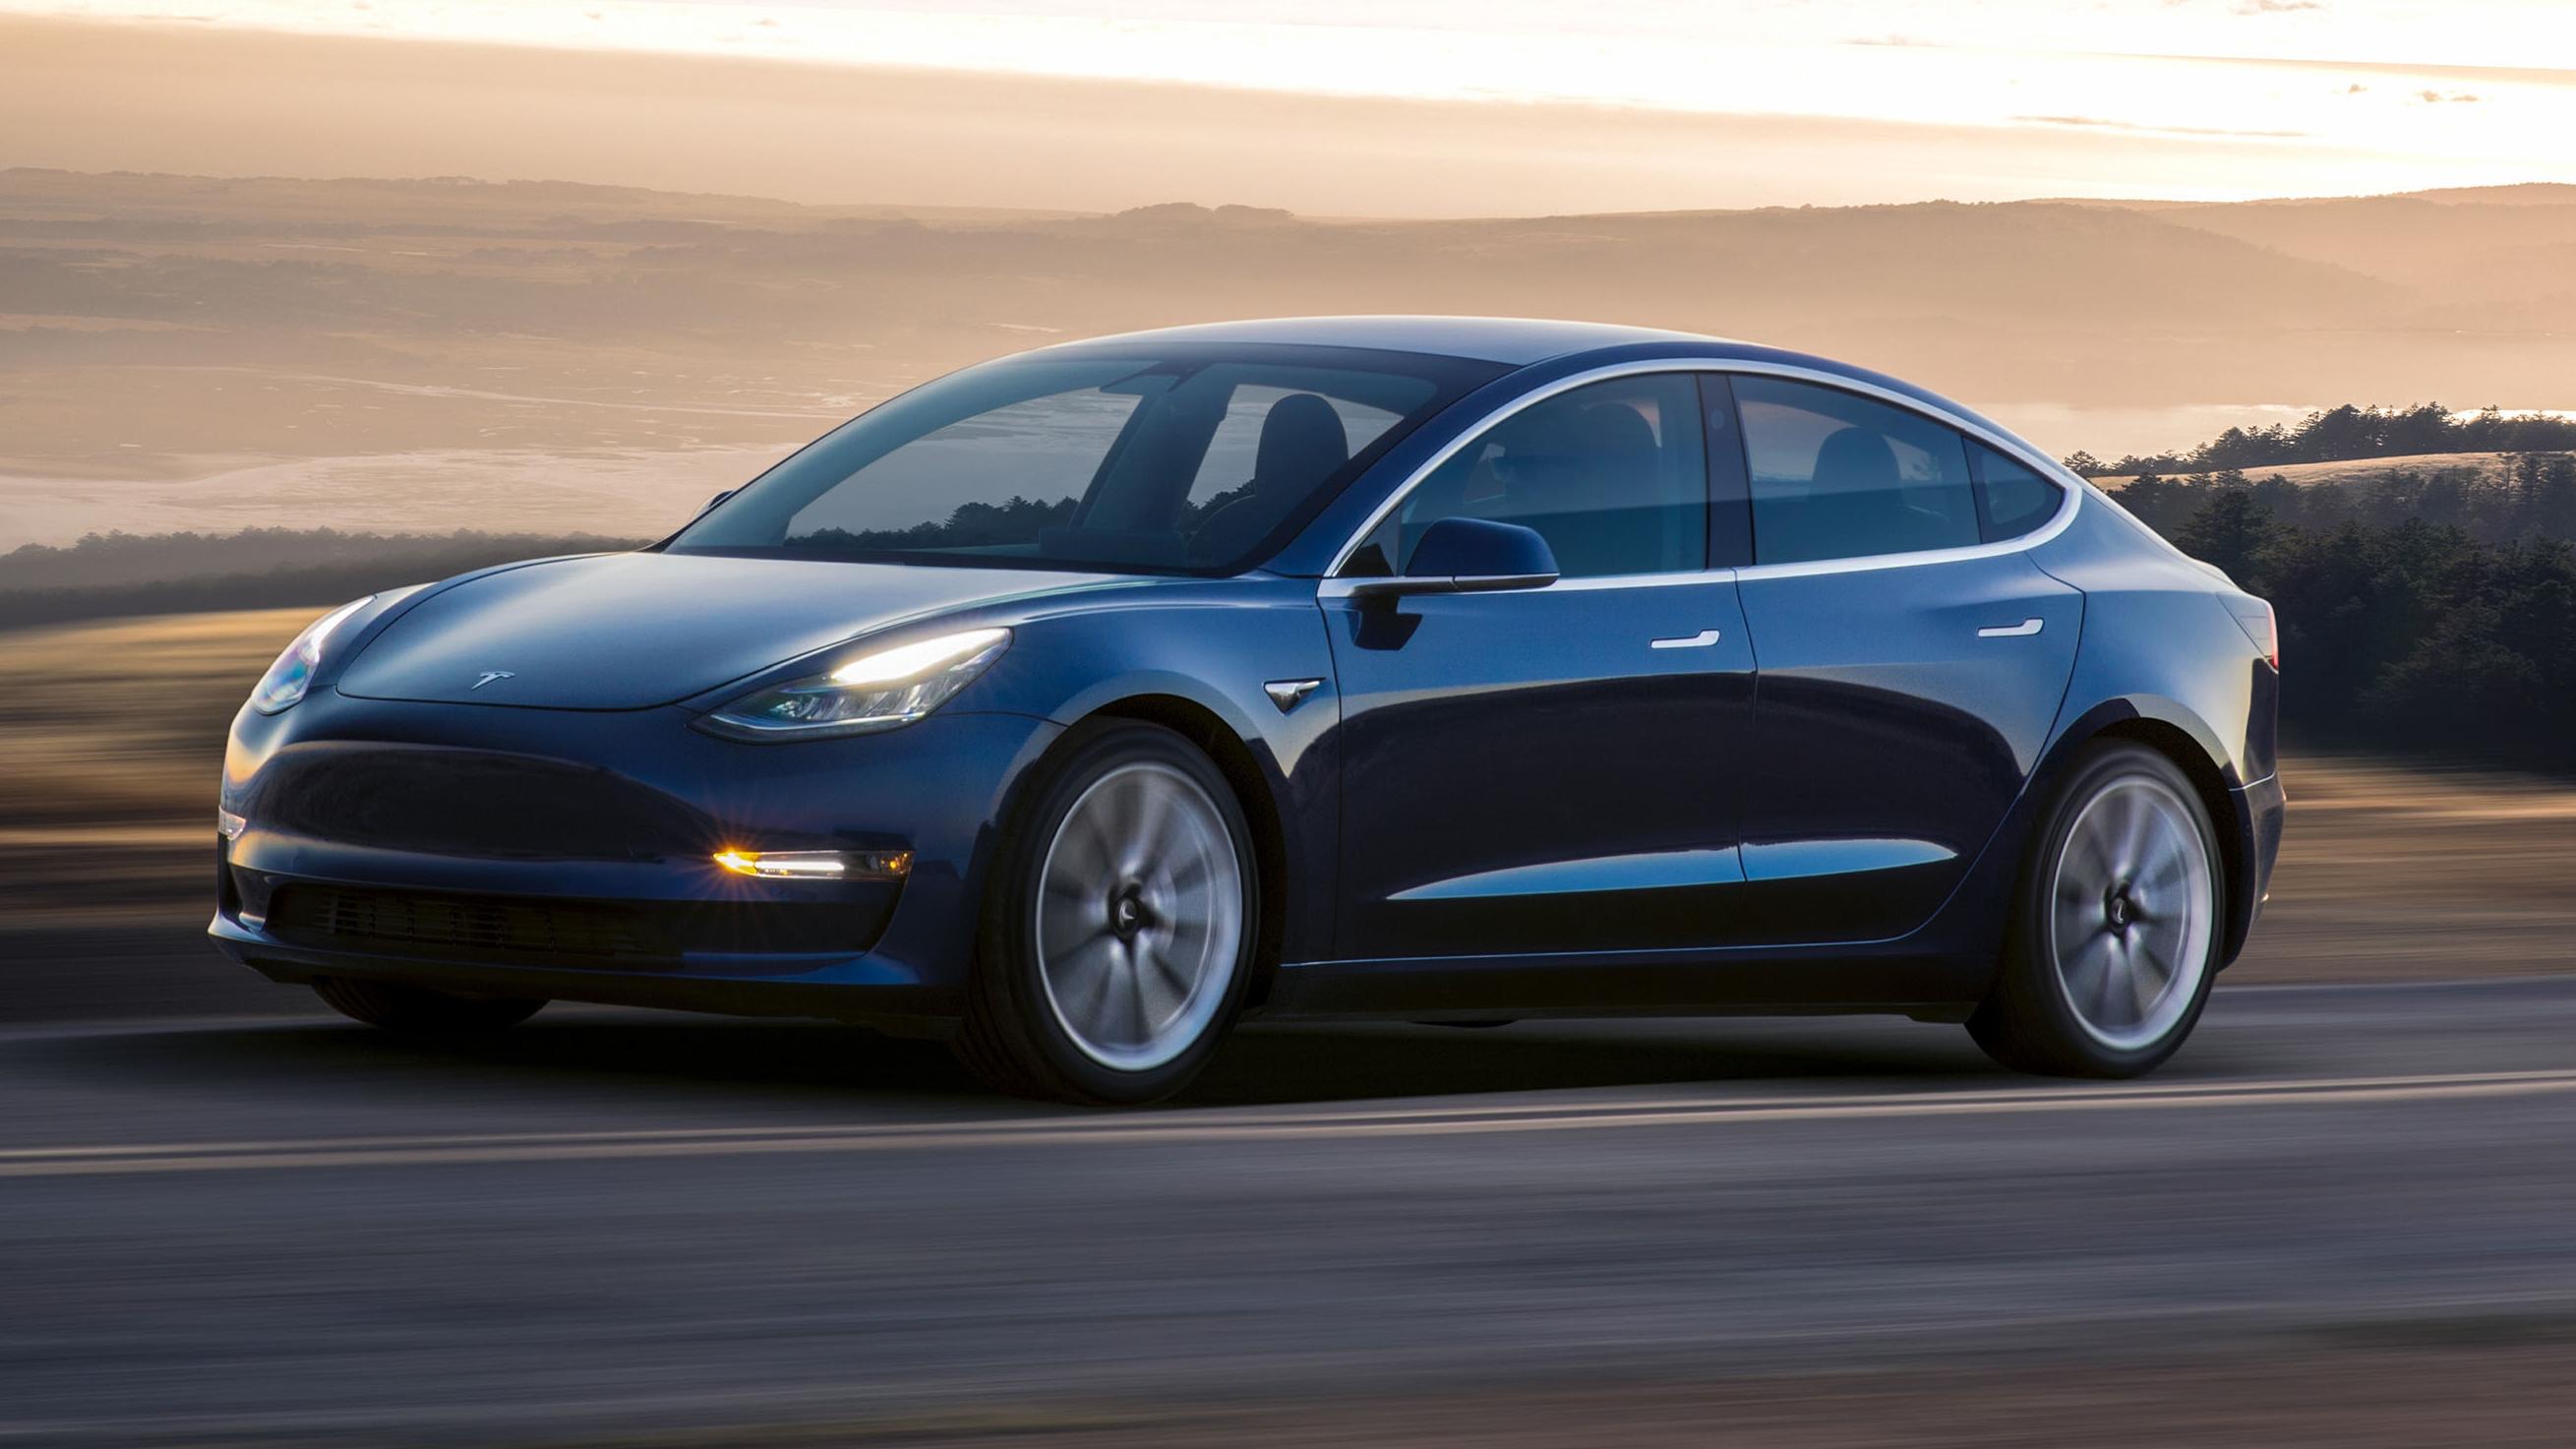 La reventa llega a las reservaciones del Tesla Model 3